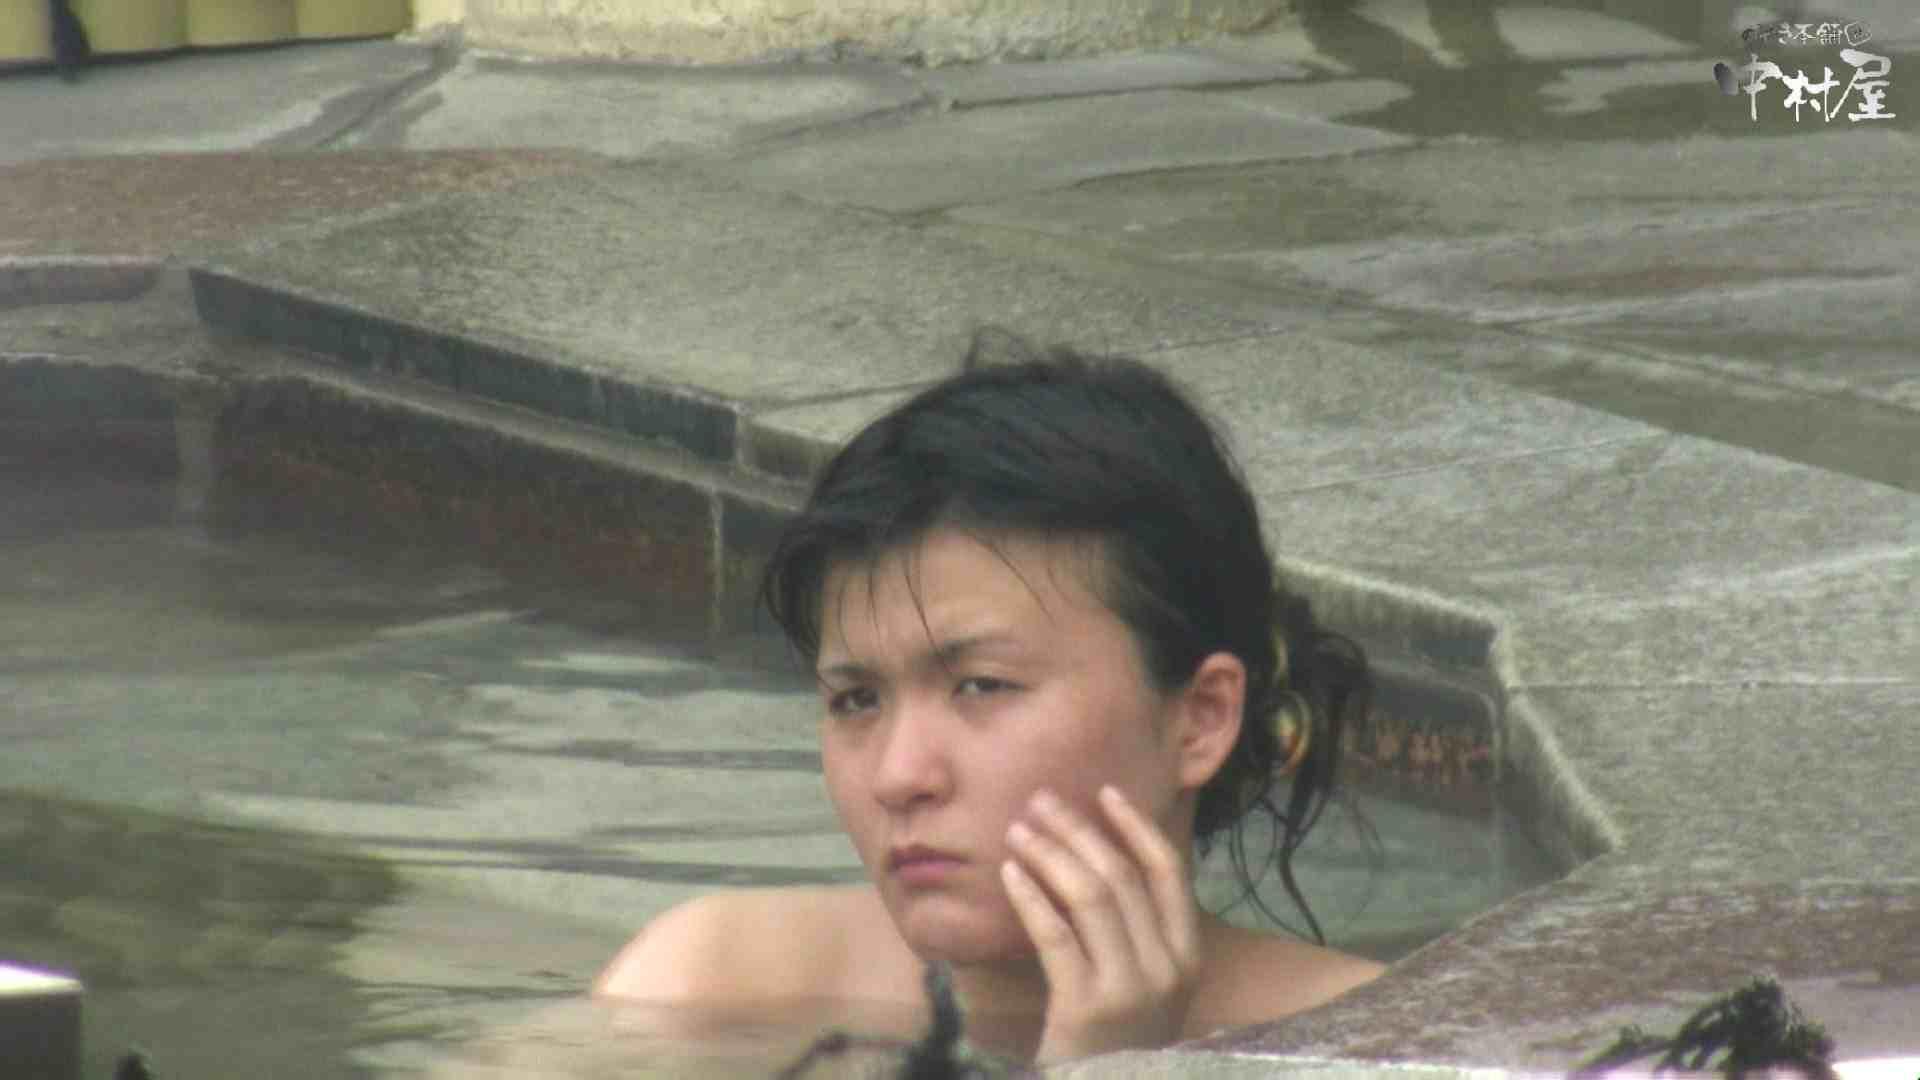 Aquaな露天風呂Vol.894 盗撮シリーズ | 露天風呂編  85PIX 49